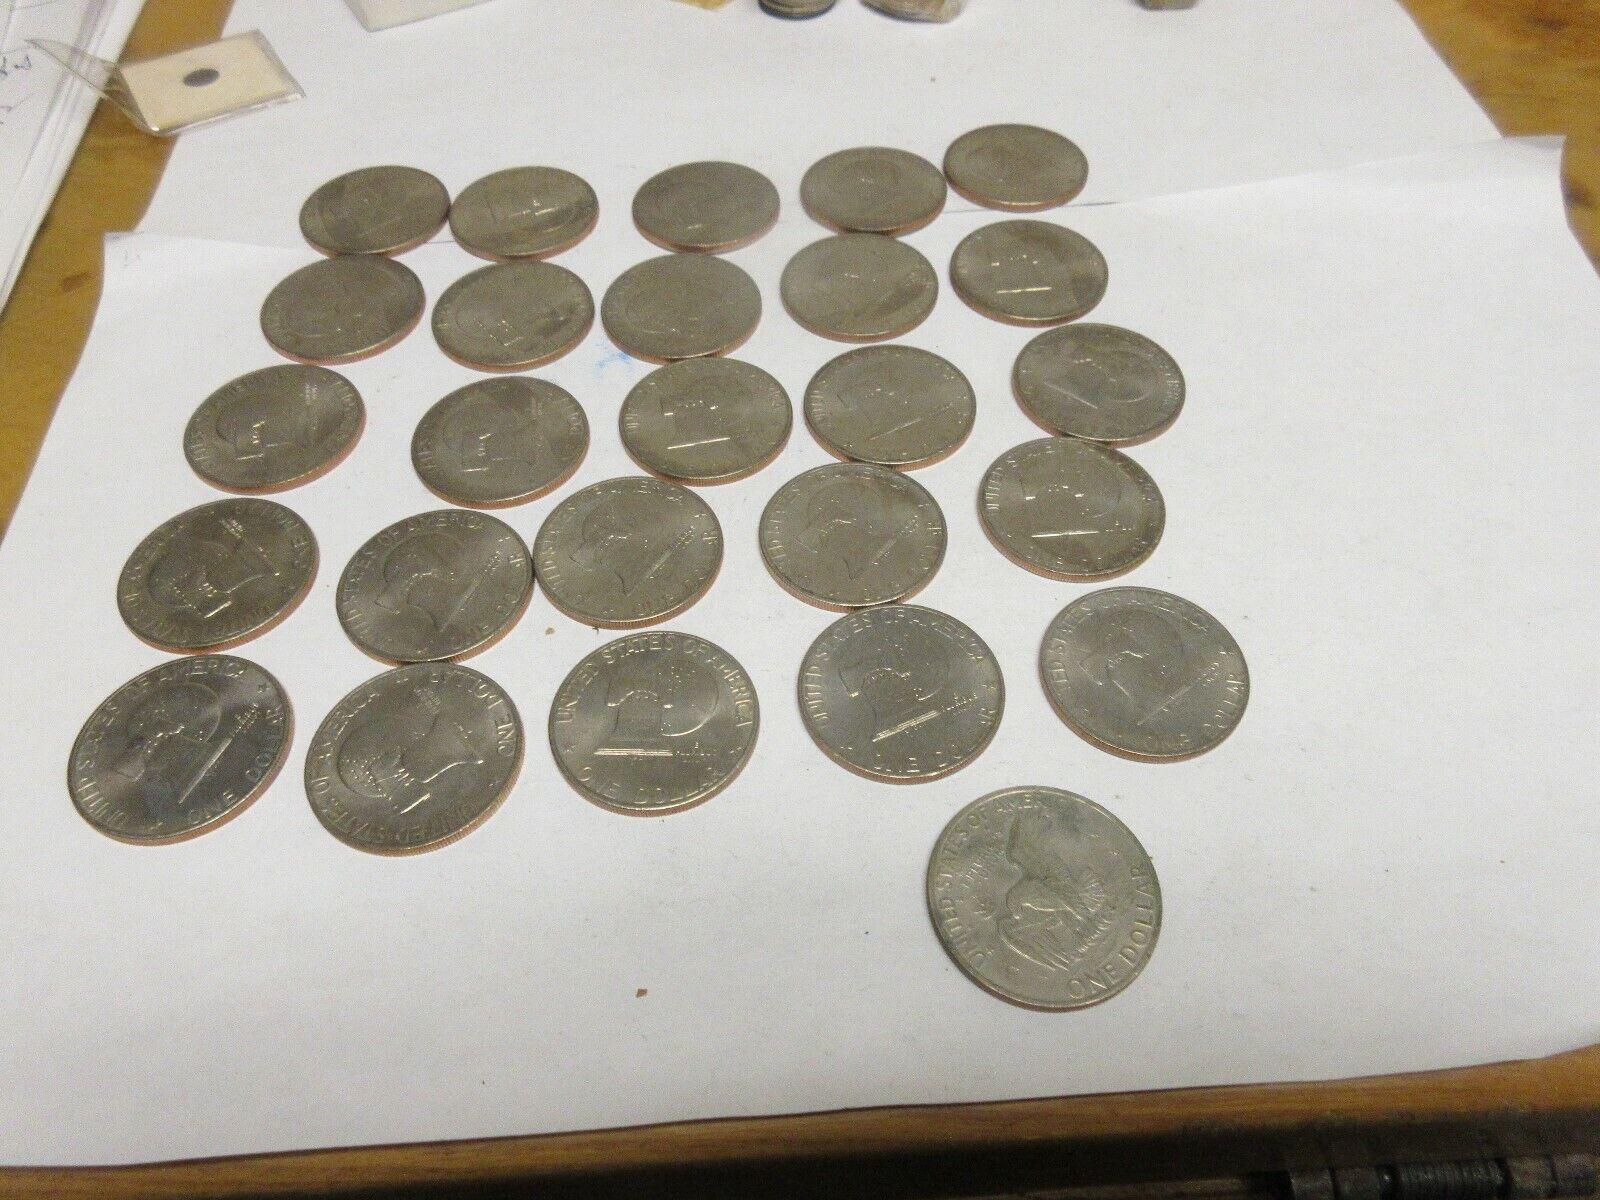 Eisenhower Dollar , Lot of 26 , 1776-1976 (25) 1972 (1)